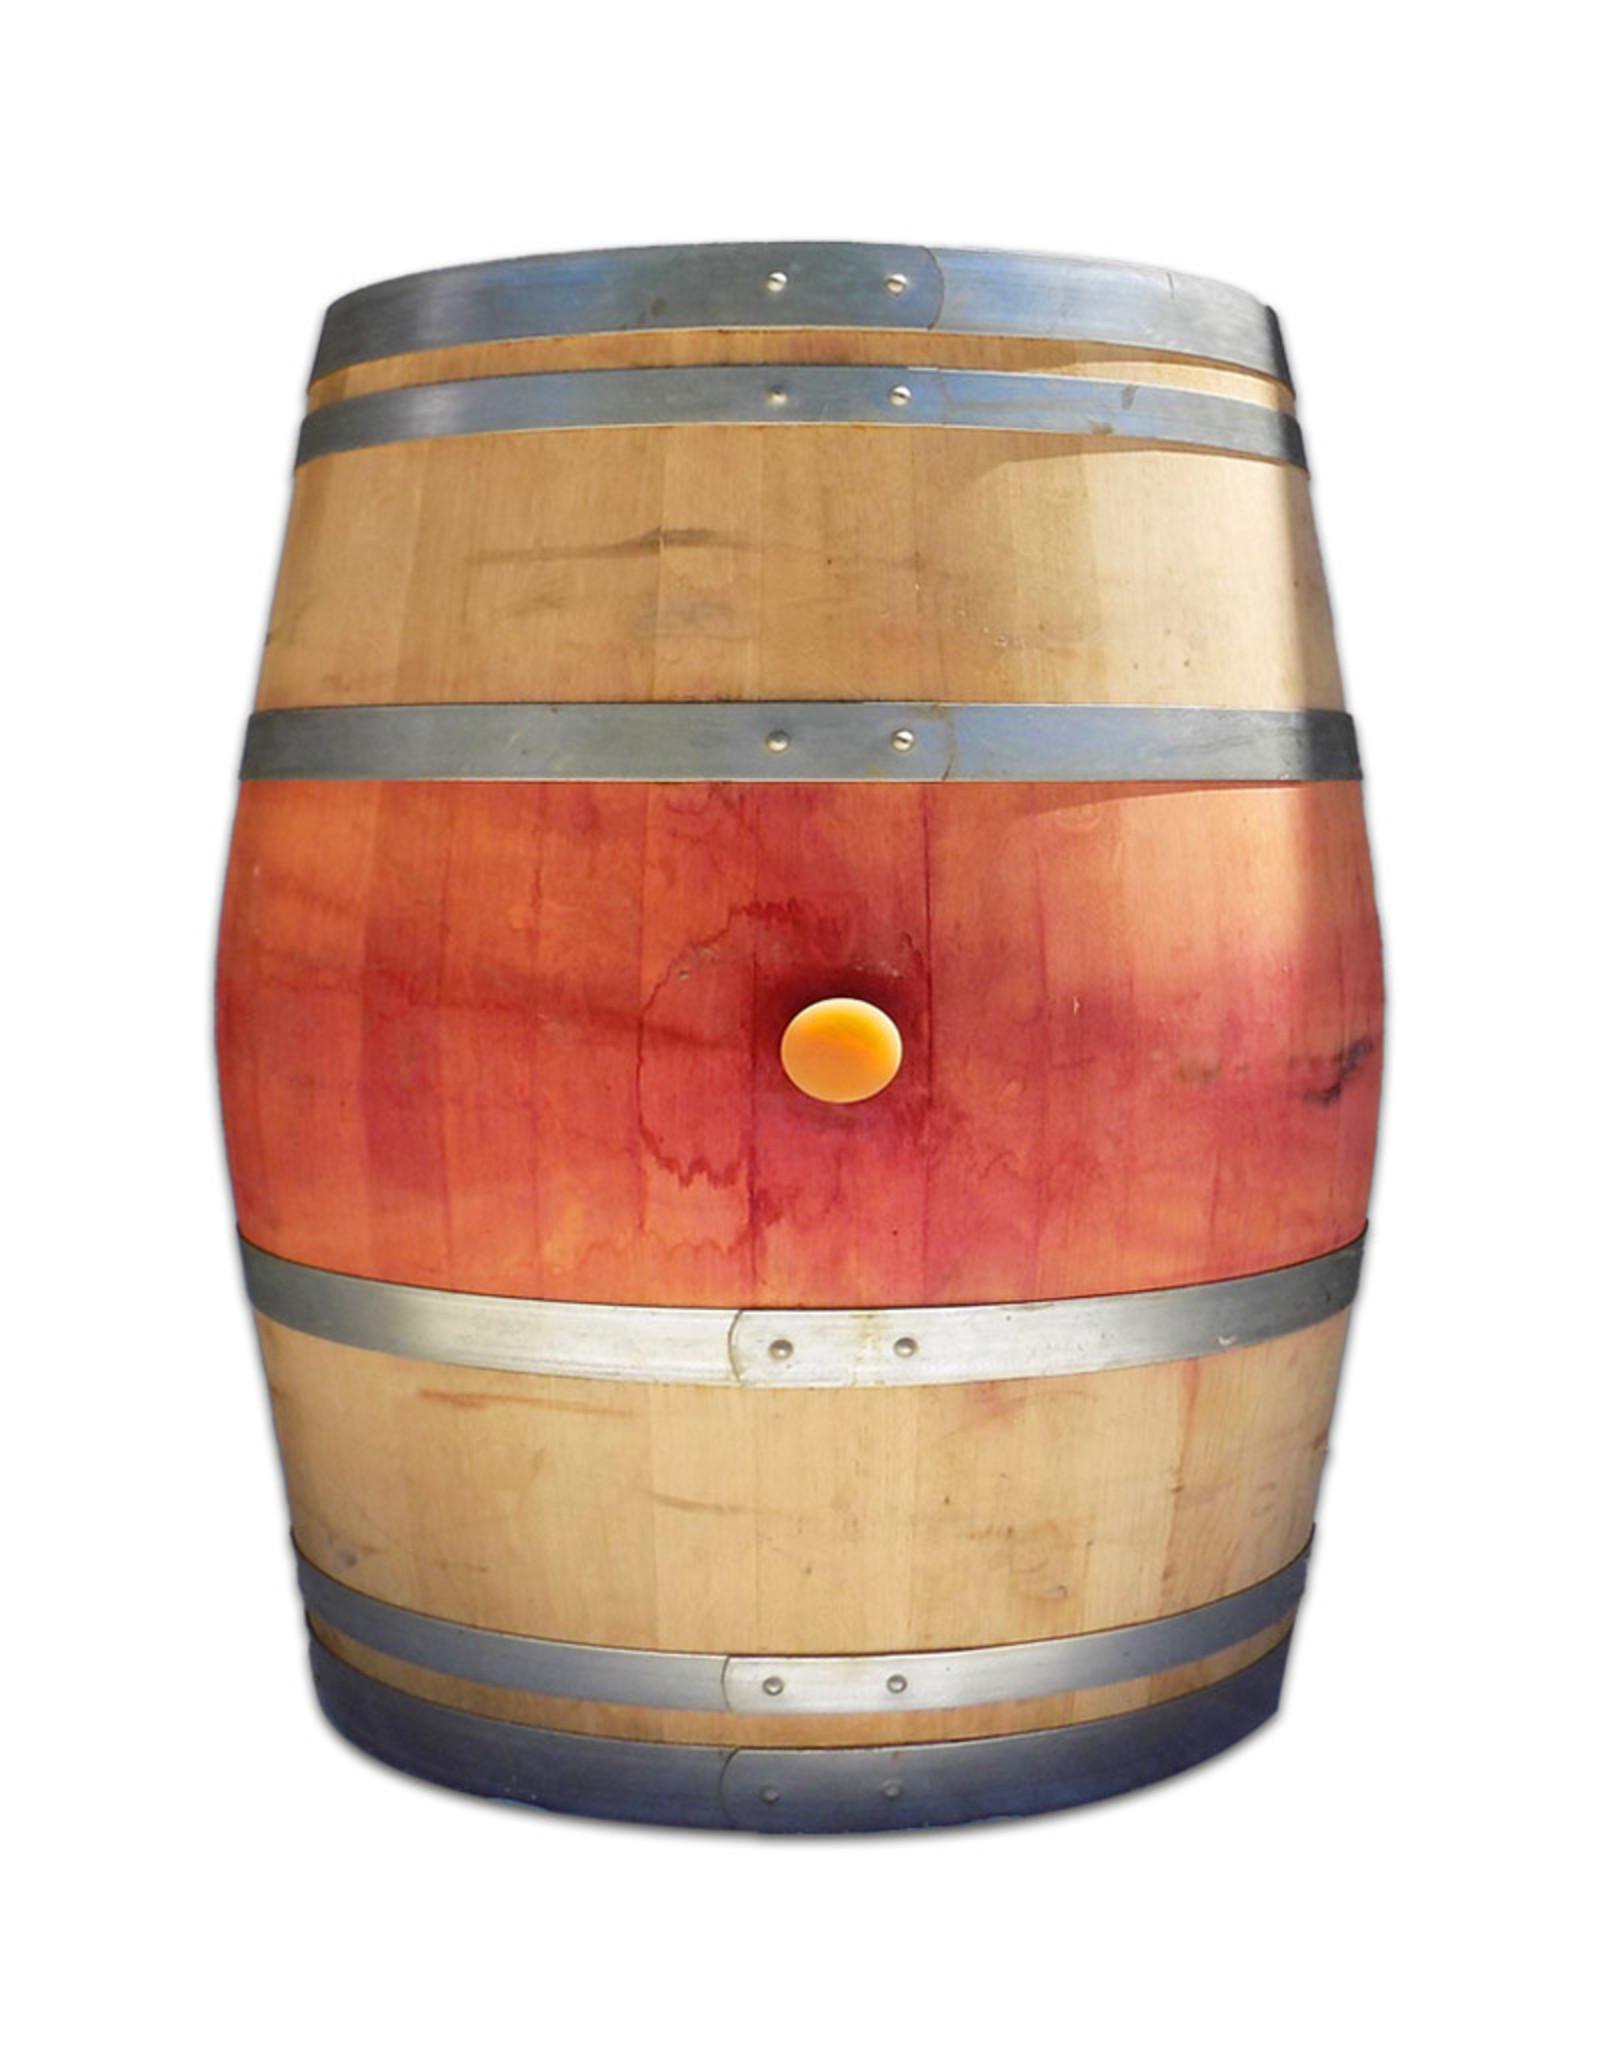 228 L RED WINE BARREL LOUIS JADOT PINOT NOIR